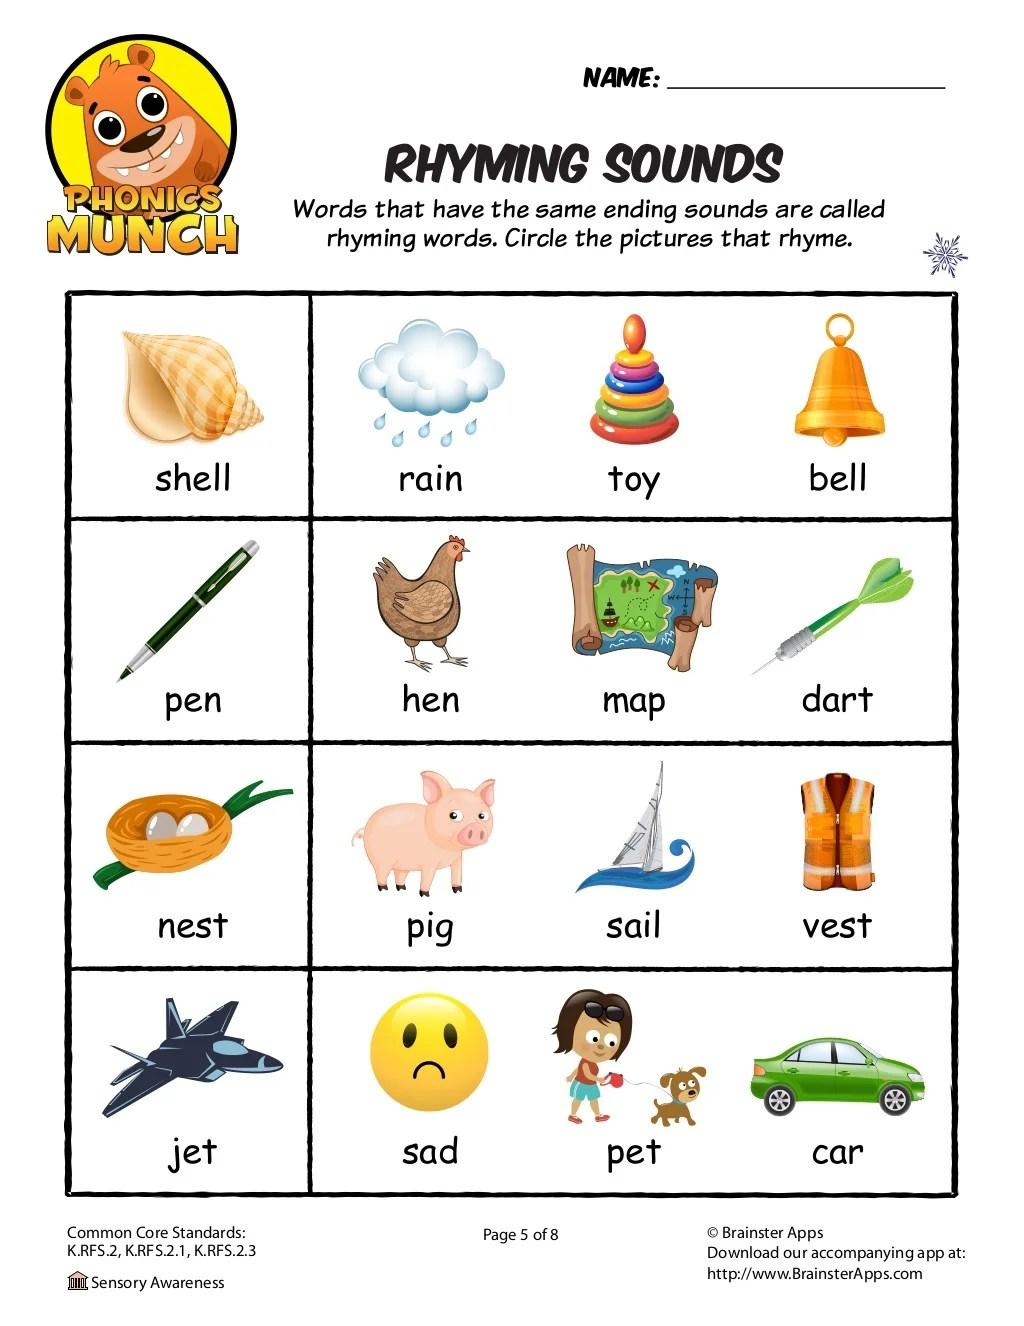 Rhyming Sounds Worksheet